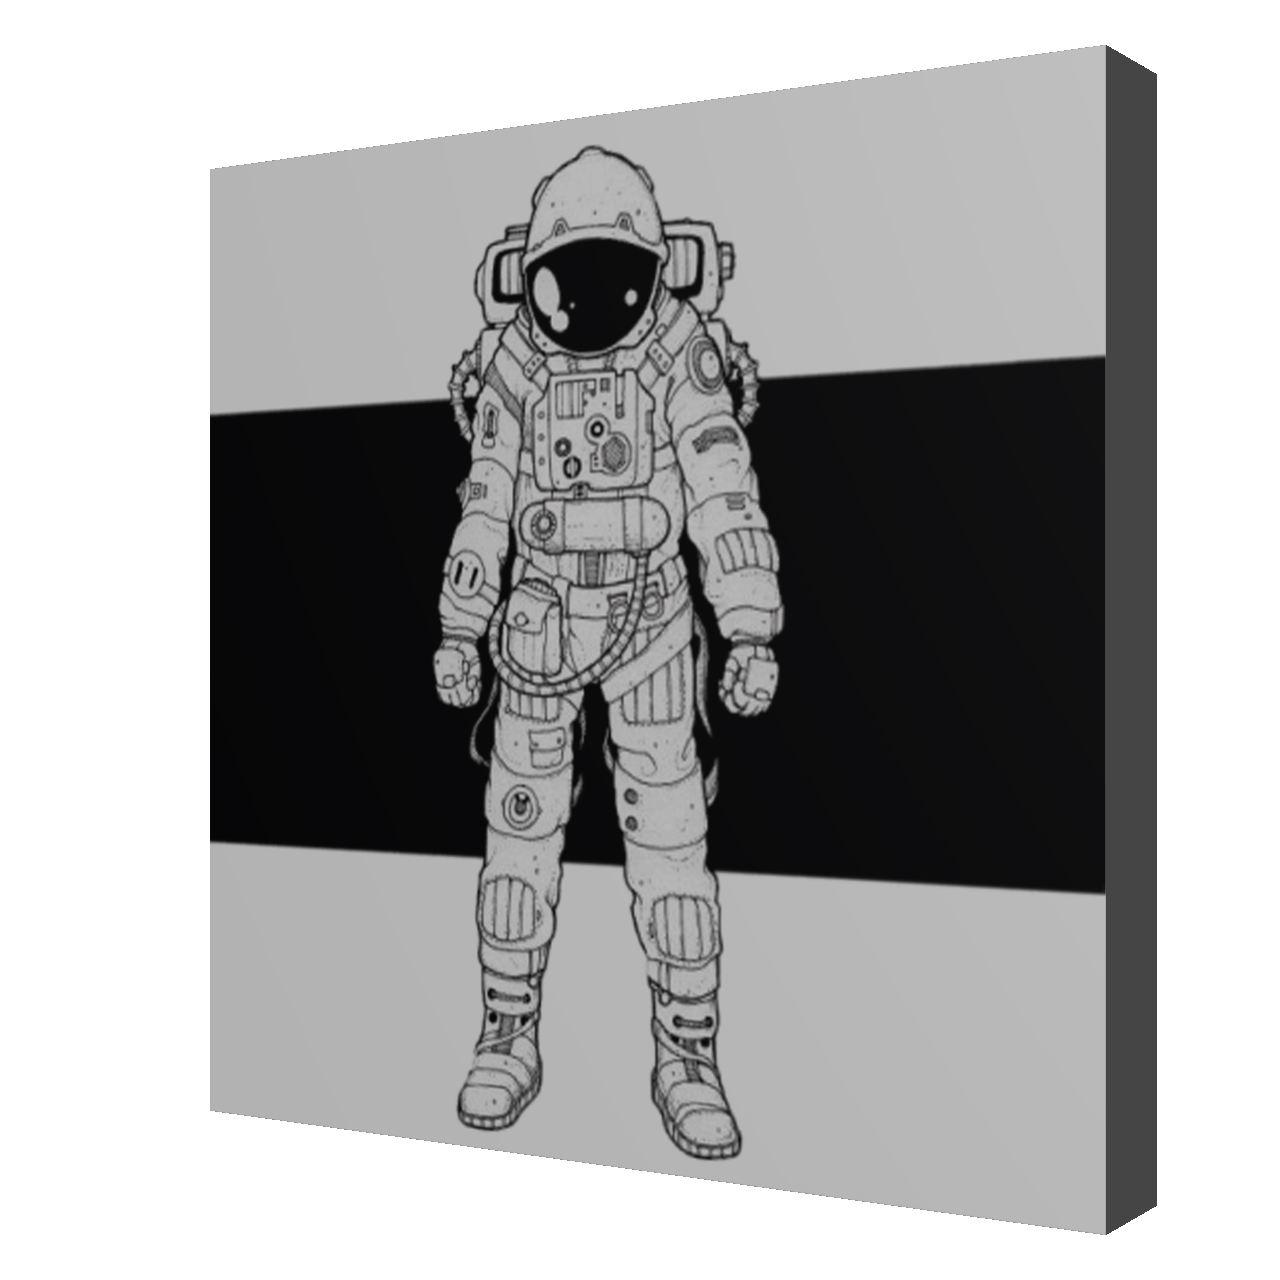 پیکسل طرح فضانورد کد 11 -  - 1